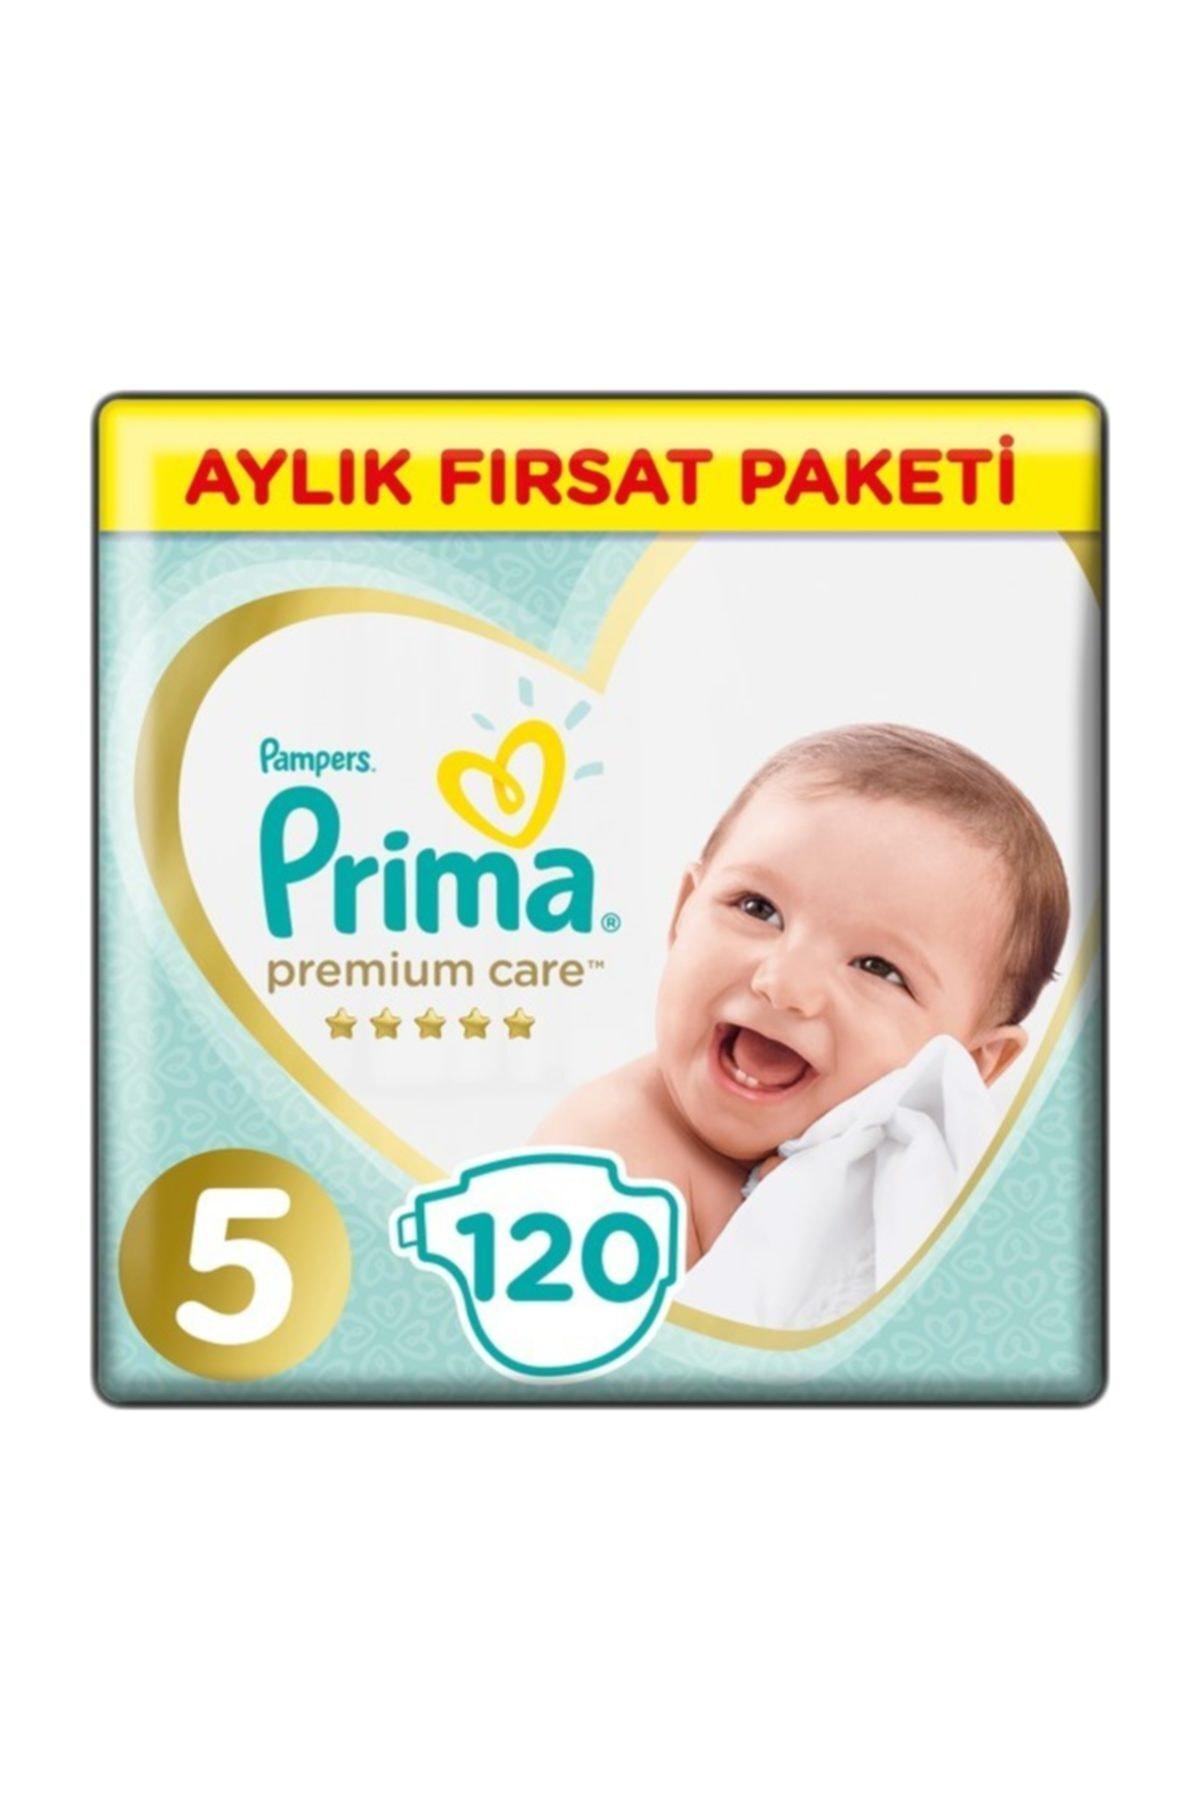 Prima Premium Care Aylık Fırsat Beden:5 (11-18Kg) Junior 120 Adet Bebek Bezi 1